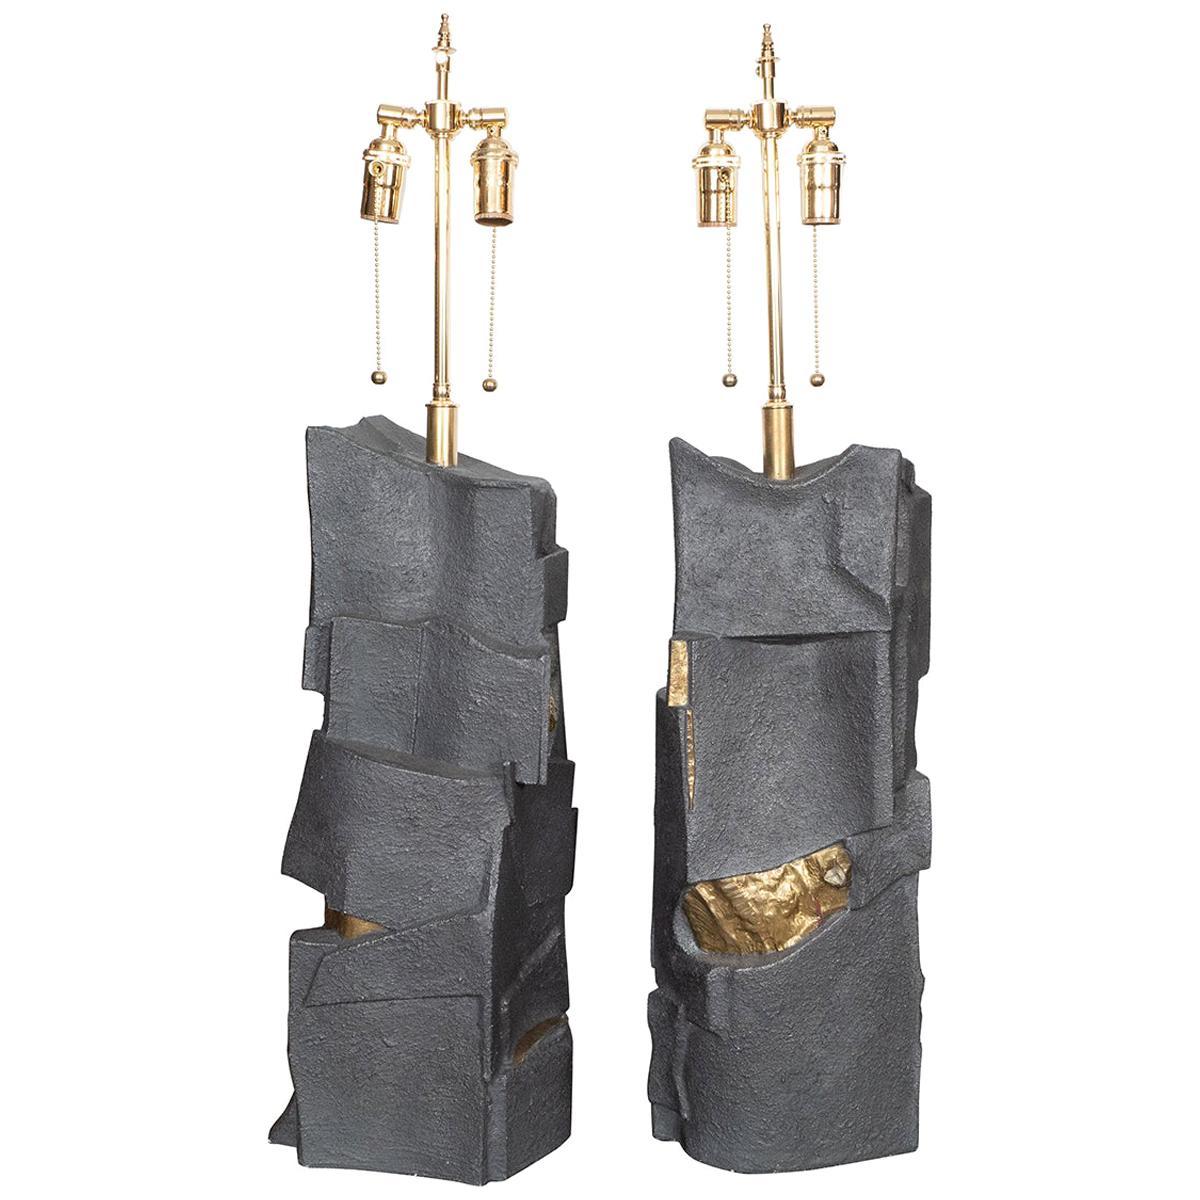 Pair of Unusual Resin Table Lamps